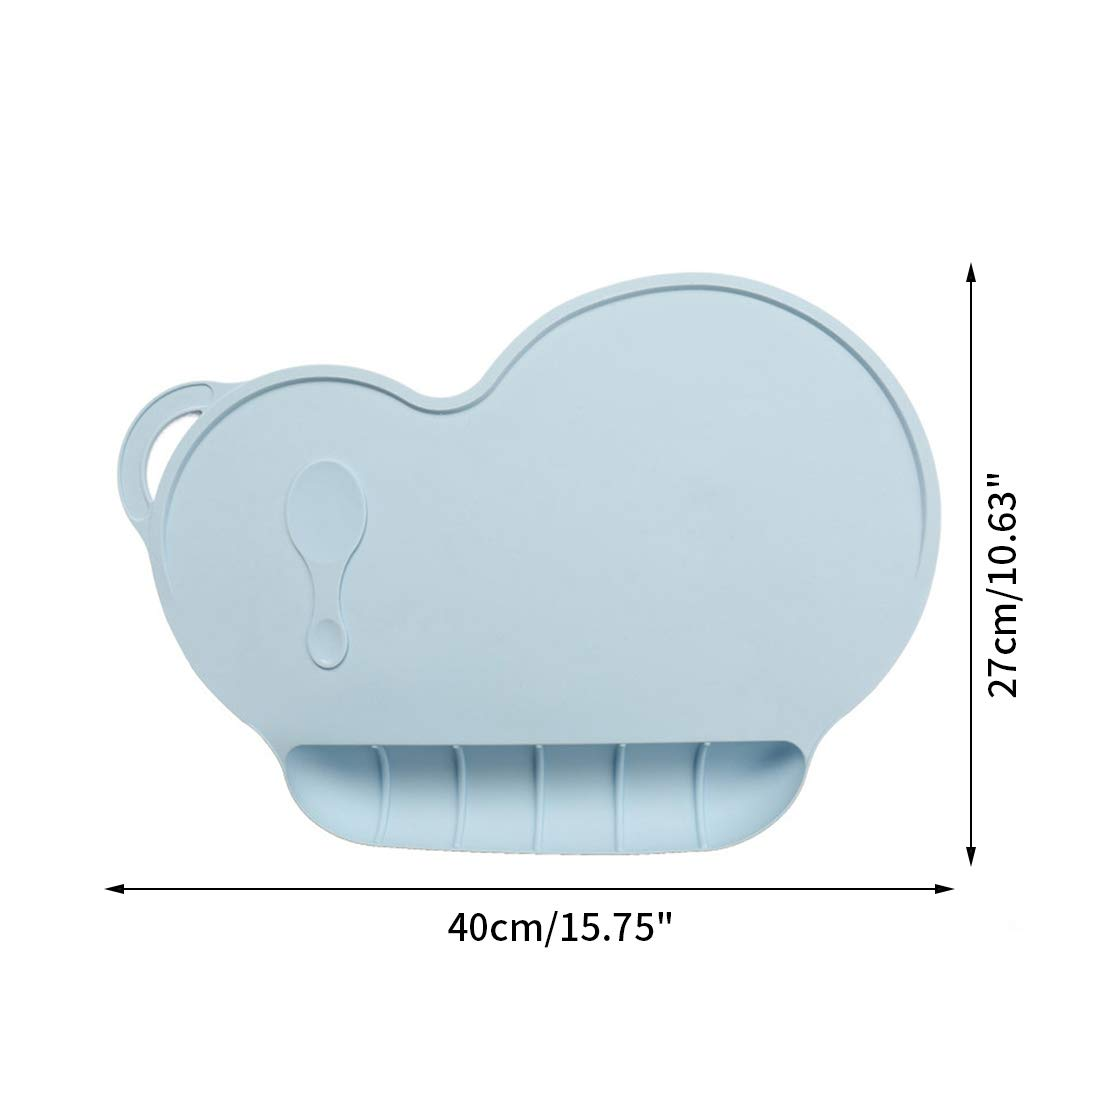 YUENA CARE Salvamantel de Beb/é Mantel Mat Mantel Individual de Silicona Estera de Tabla Para Beb/é y Ni/ño con Ventosa Antideslizante Azul